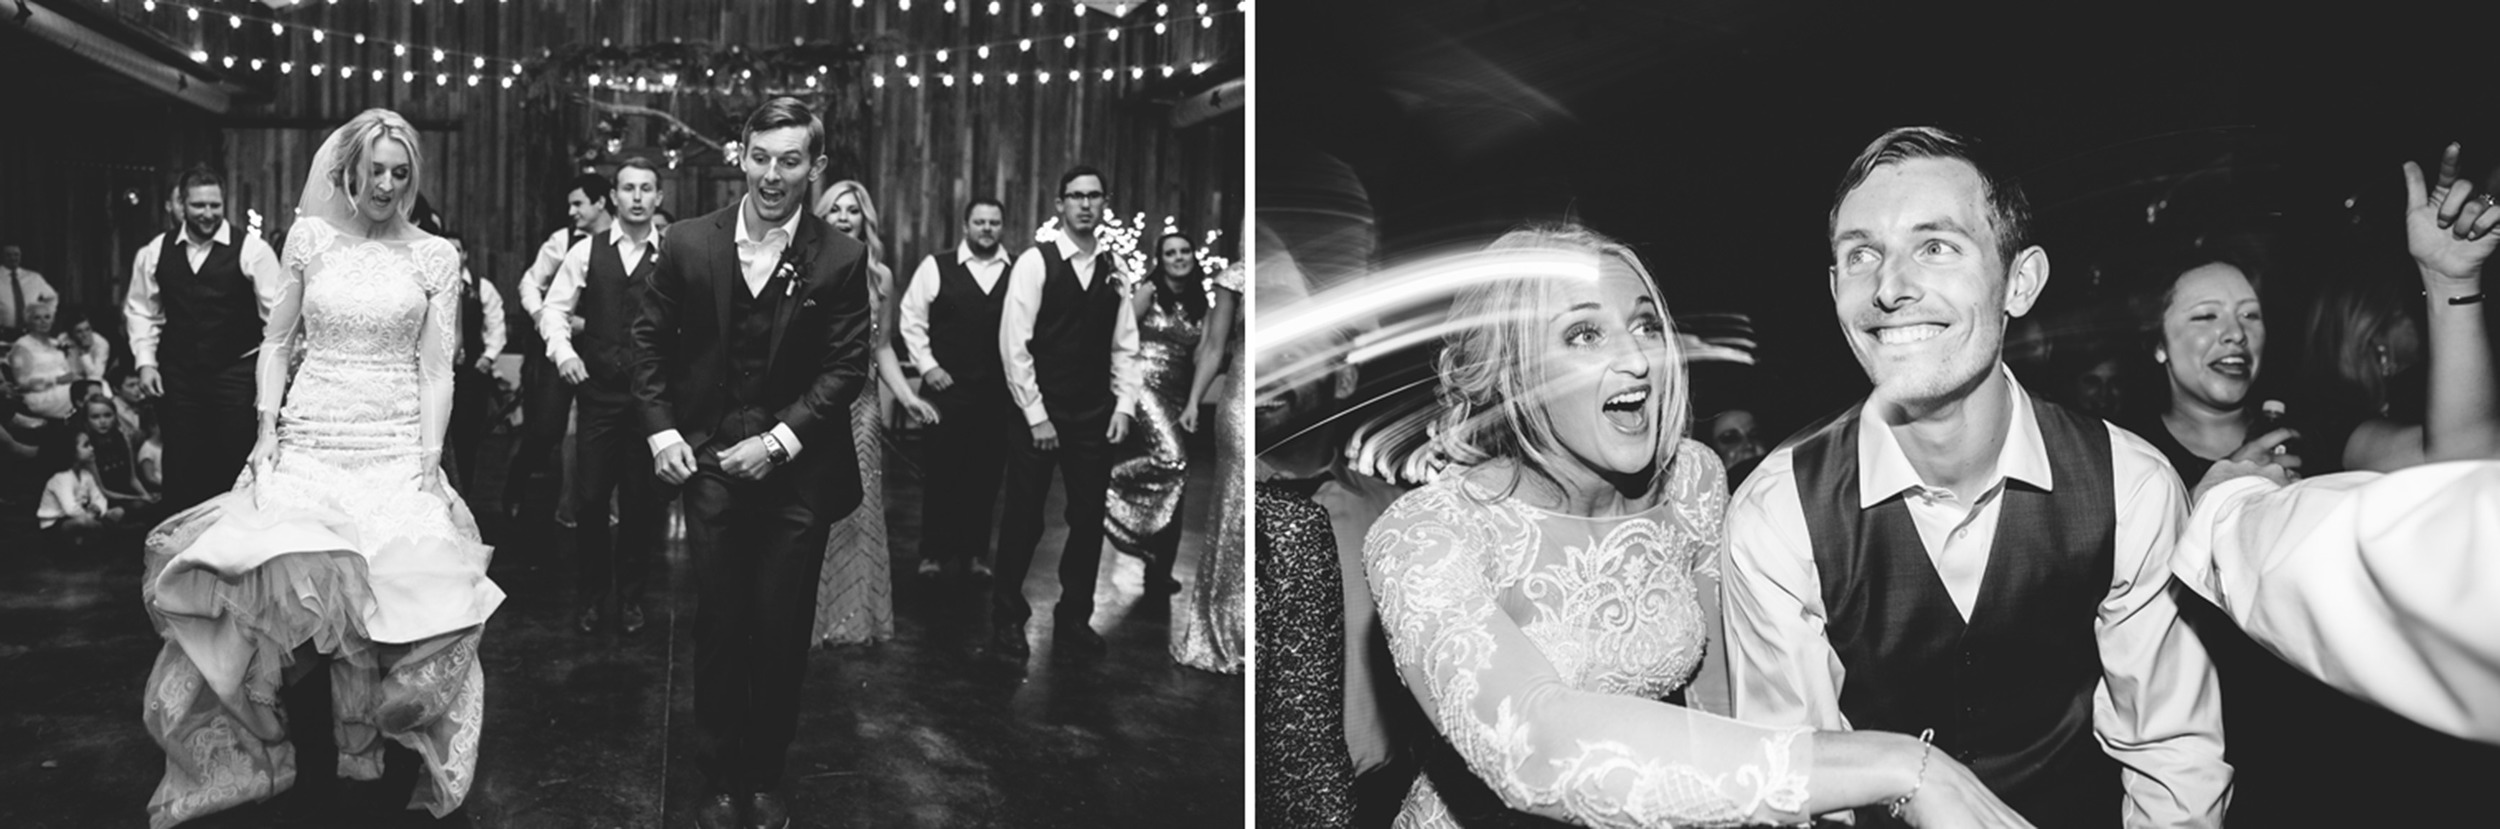 Cotton_Creek_Barn_Winter_Wedding_WeddingPhotographer059.jpg